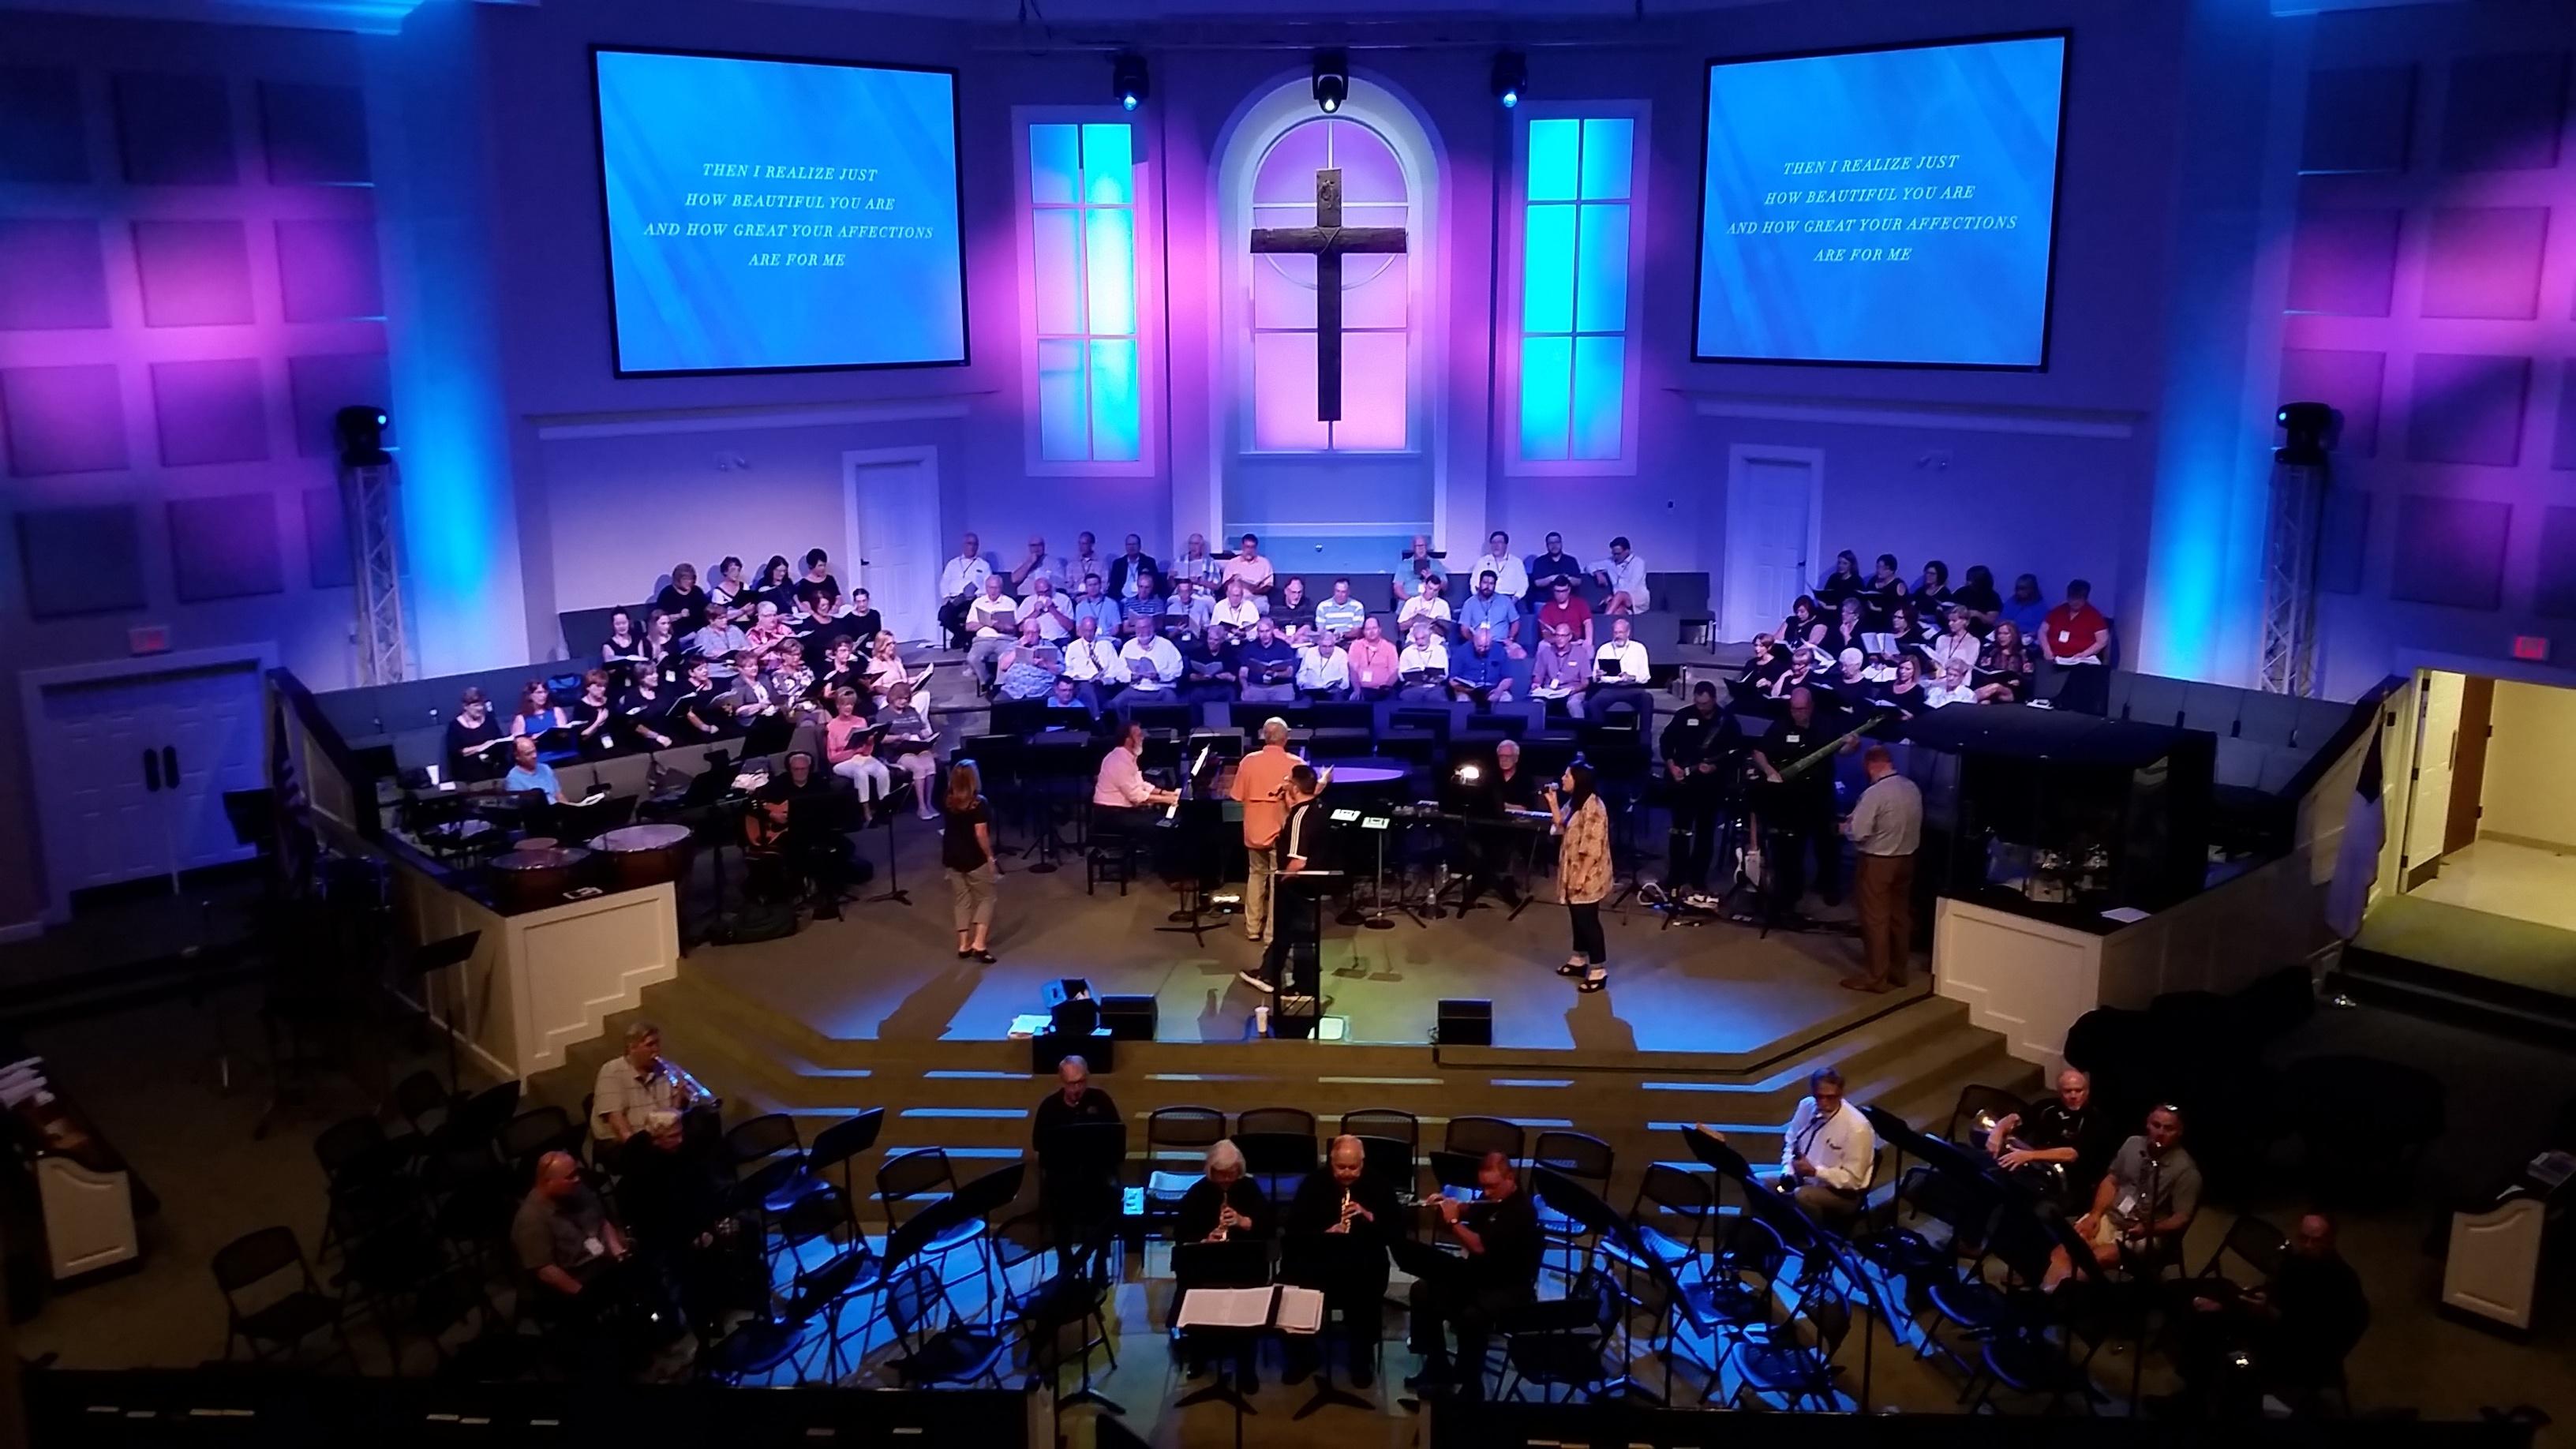 FBC Summit Church AVL System Upgrade